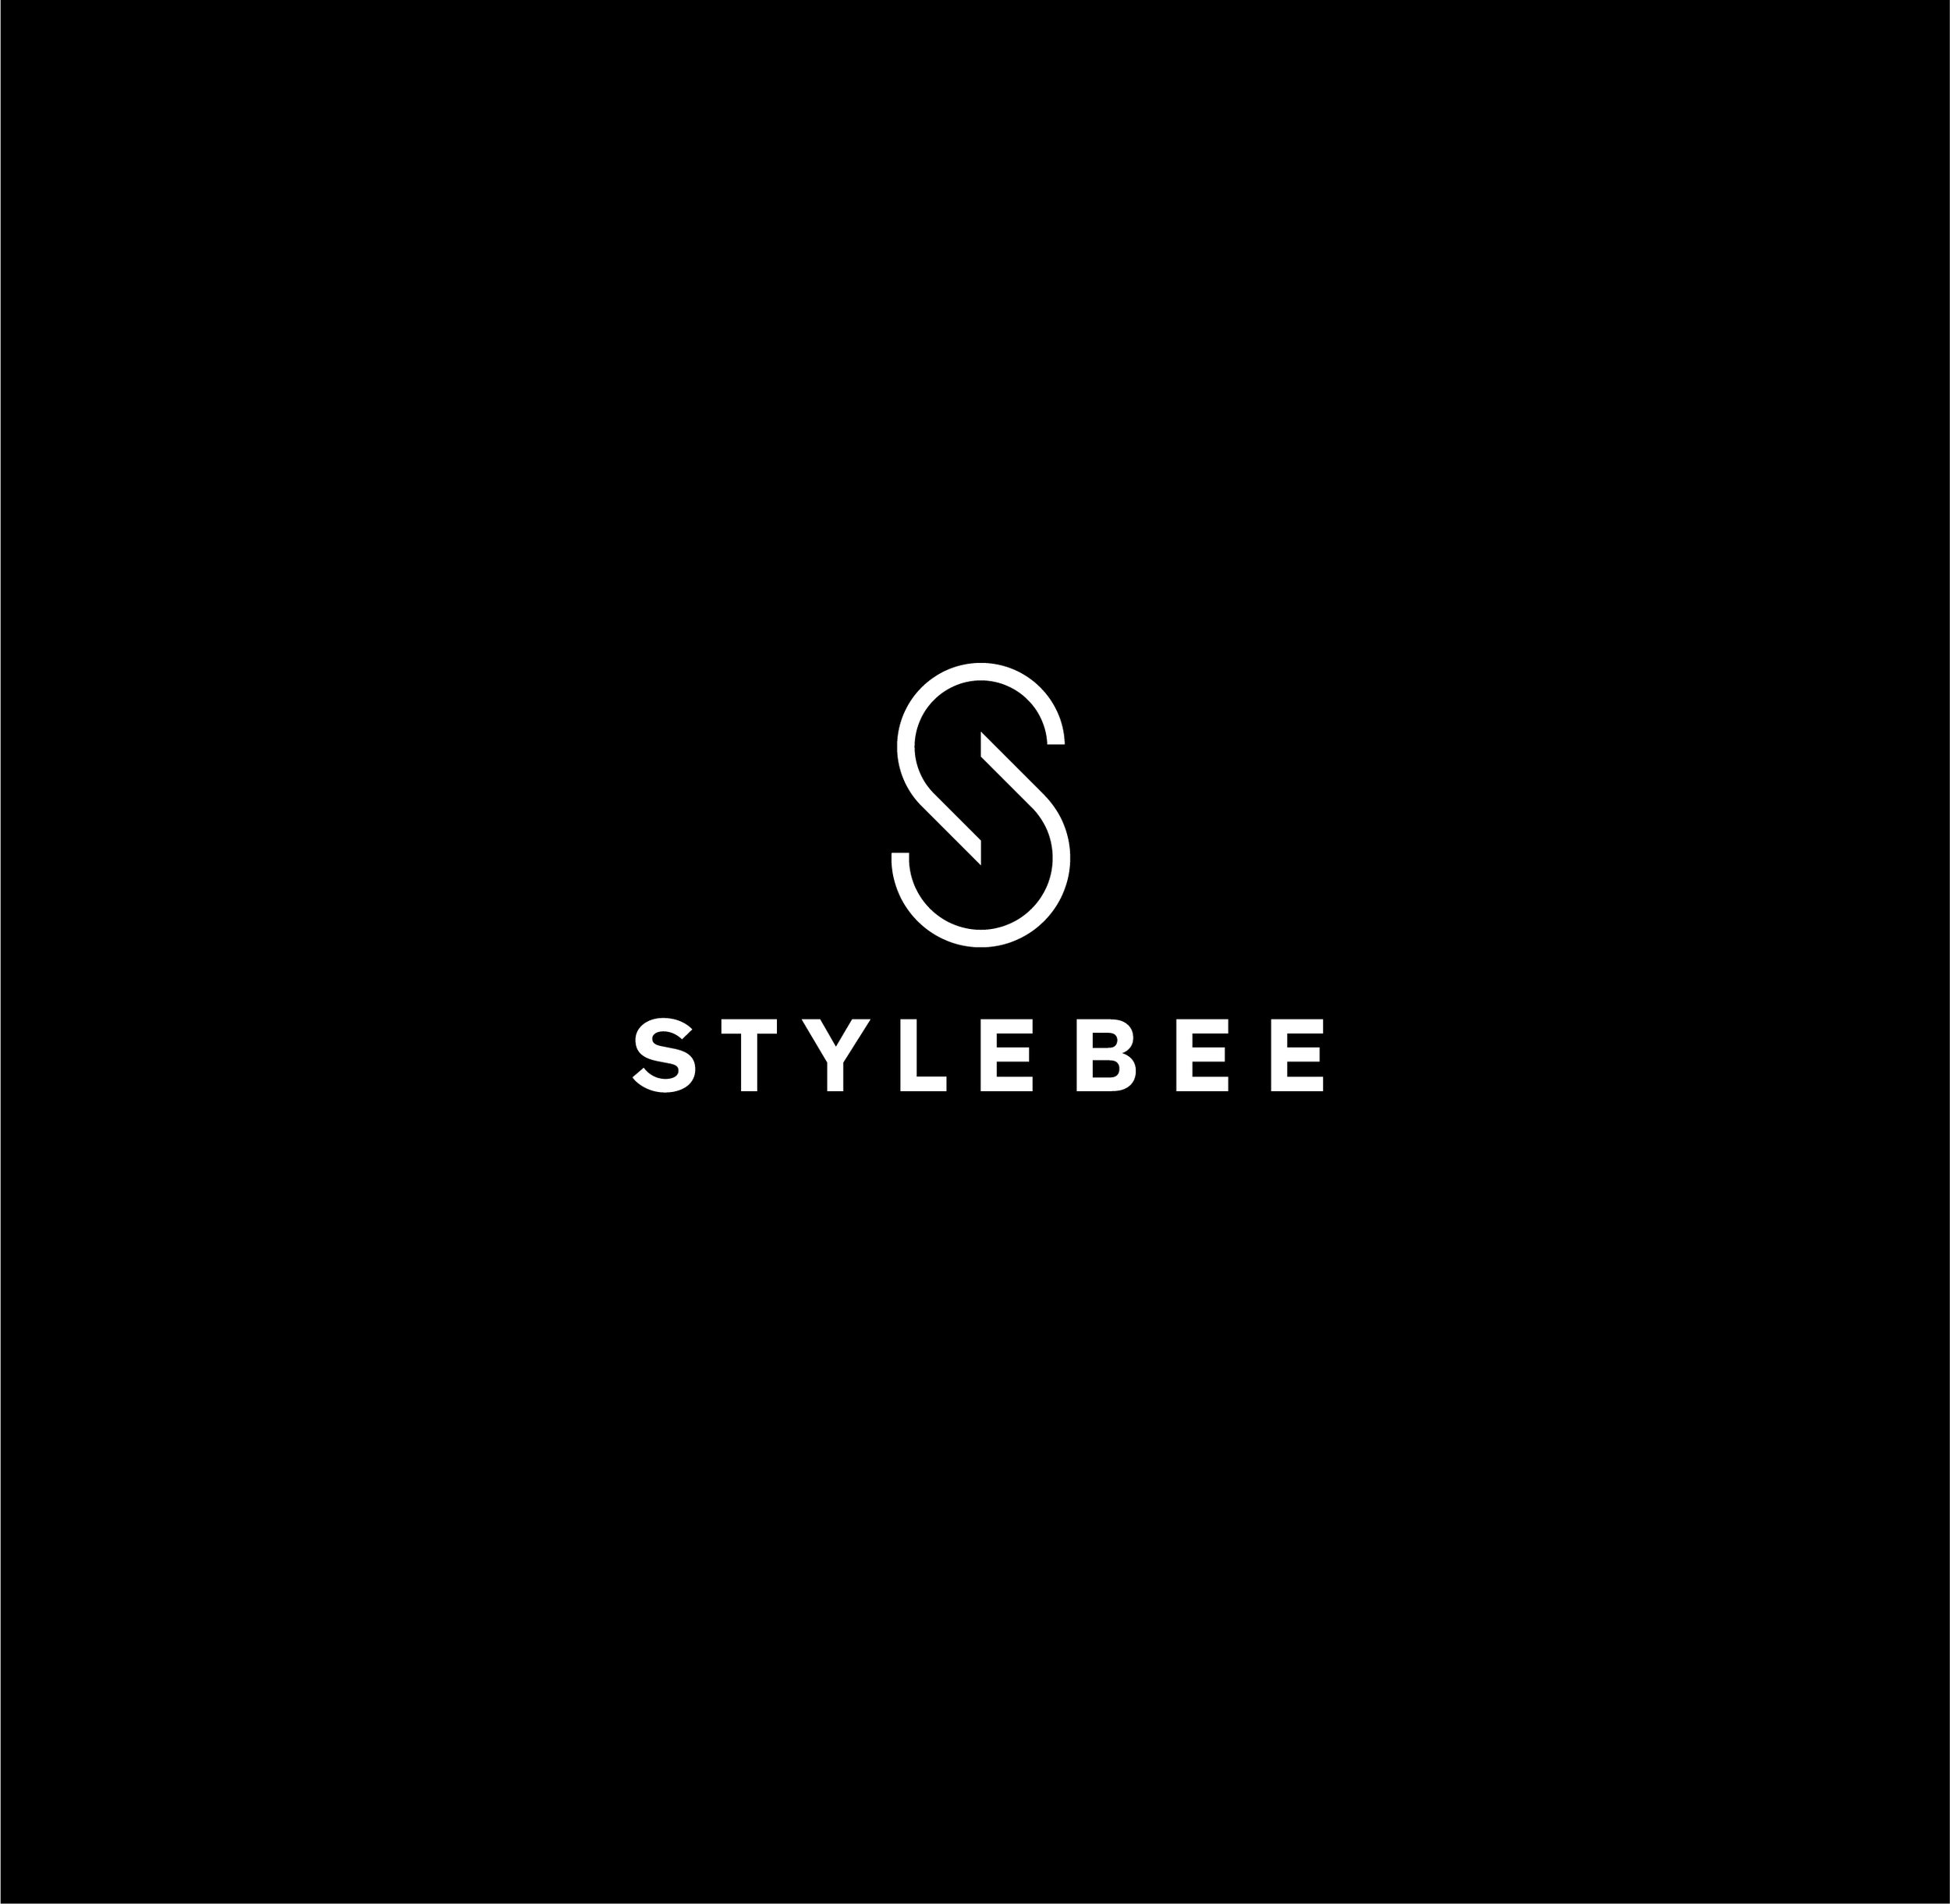 20181121_Penny_Lorber_StyleBee_PL_1-13.jpg